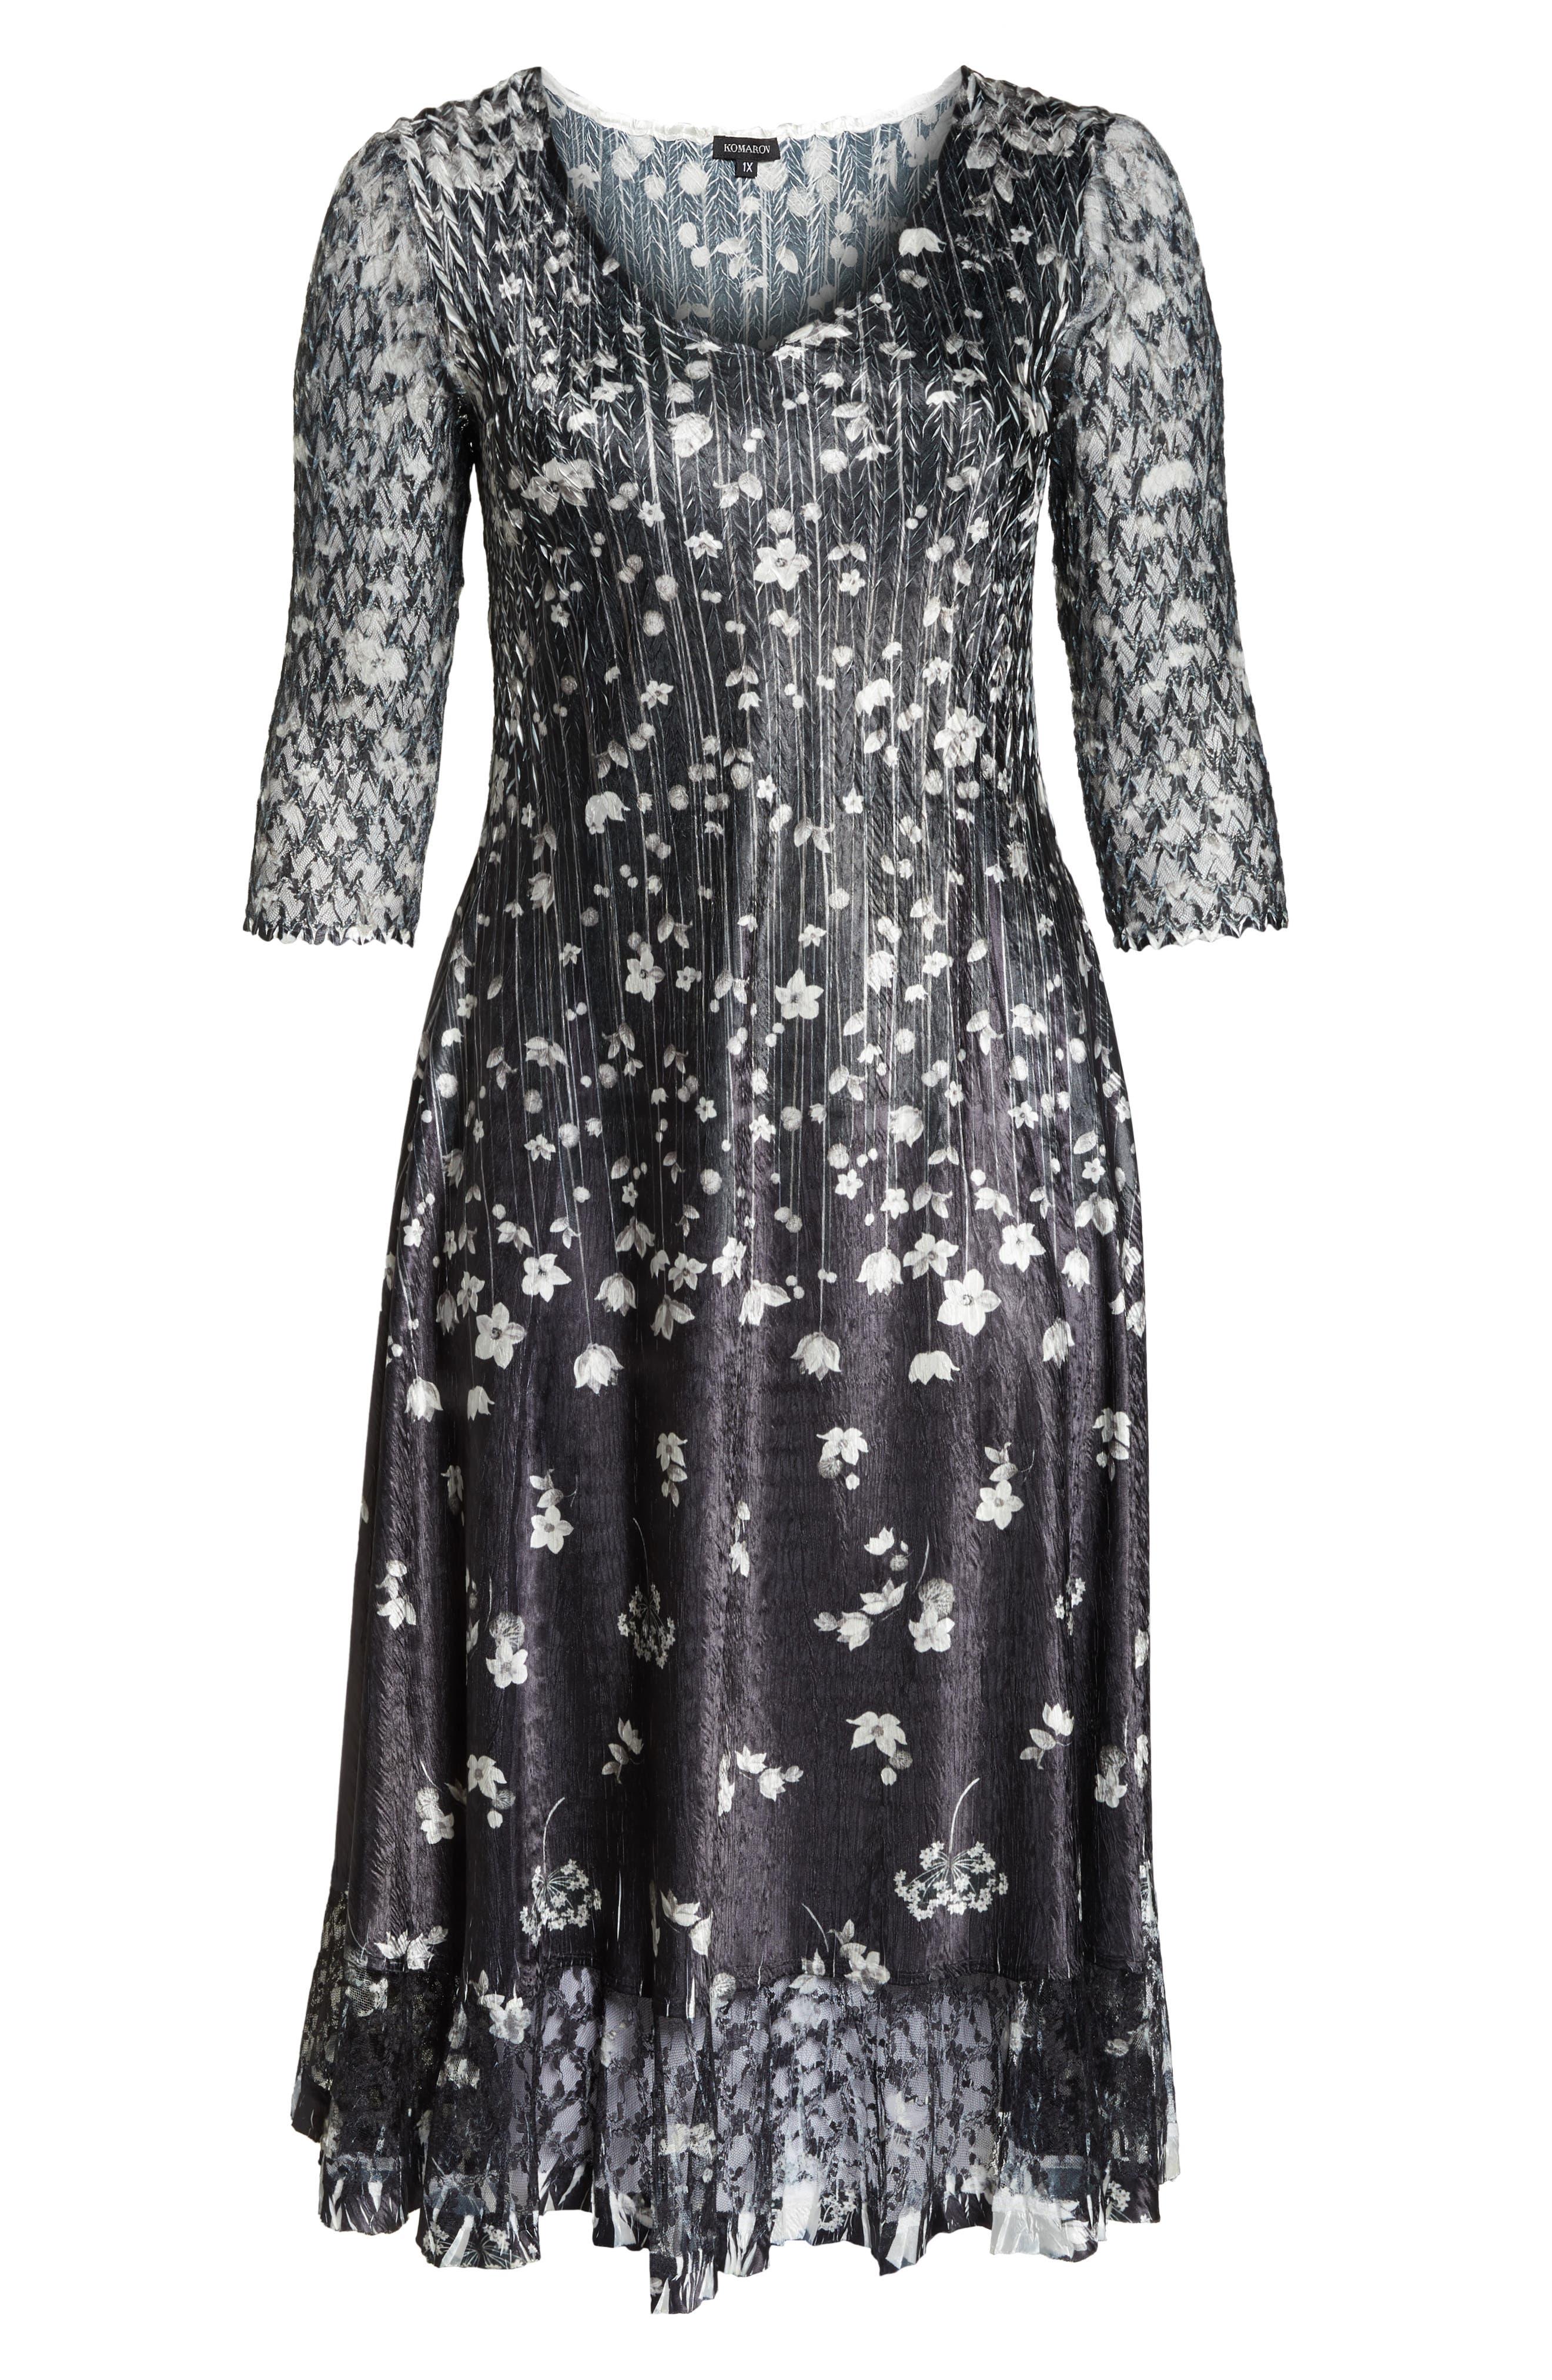 KOMAROV, Floral Print A-Line Dress, Alternate thumbnail 7, color, BLACK MEADOW